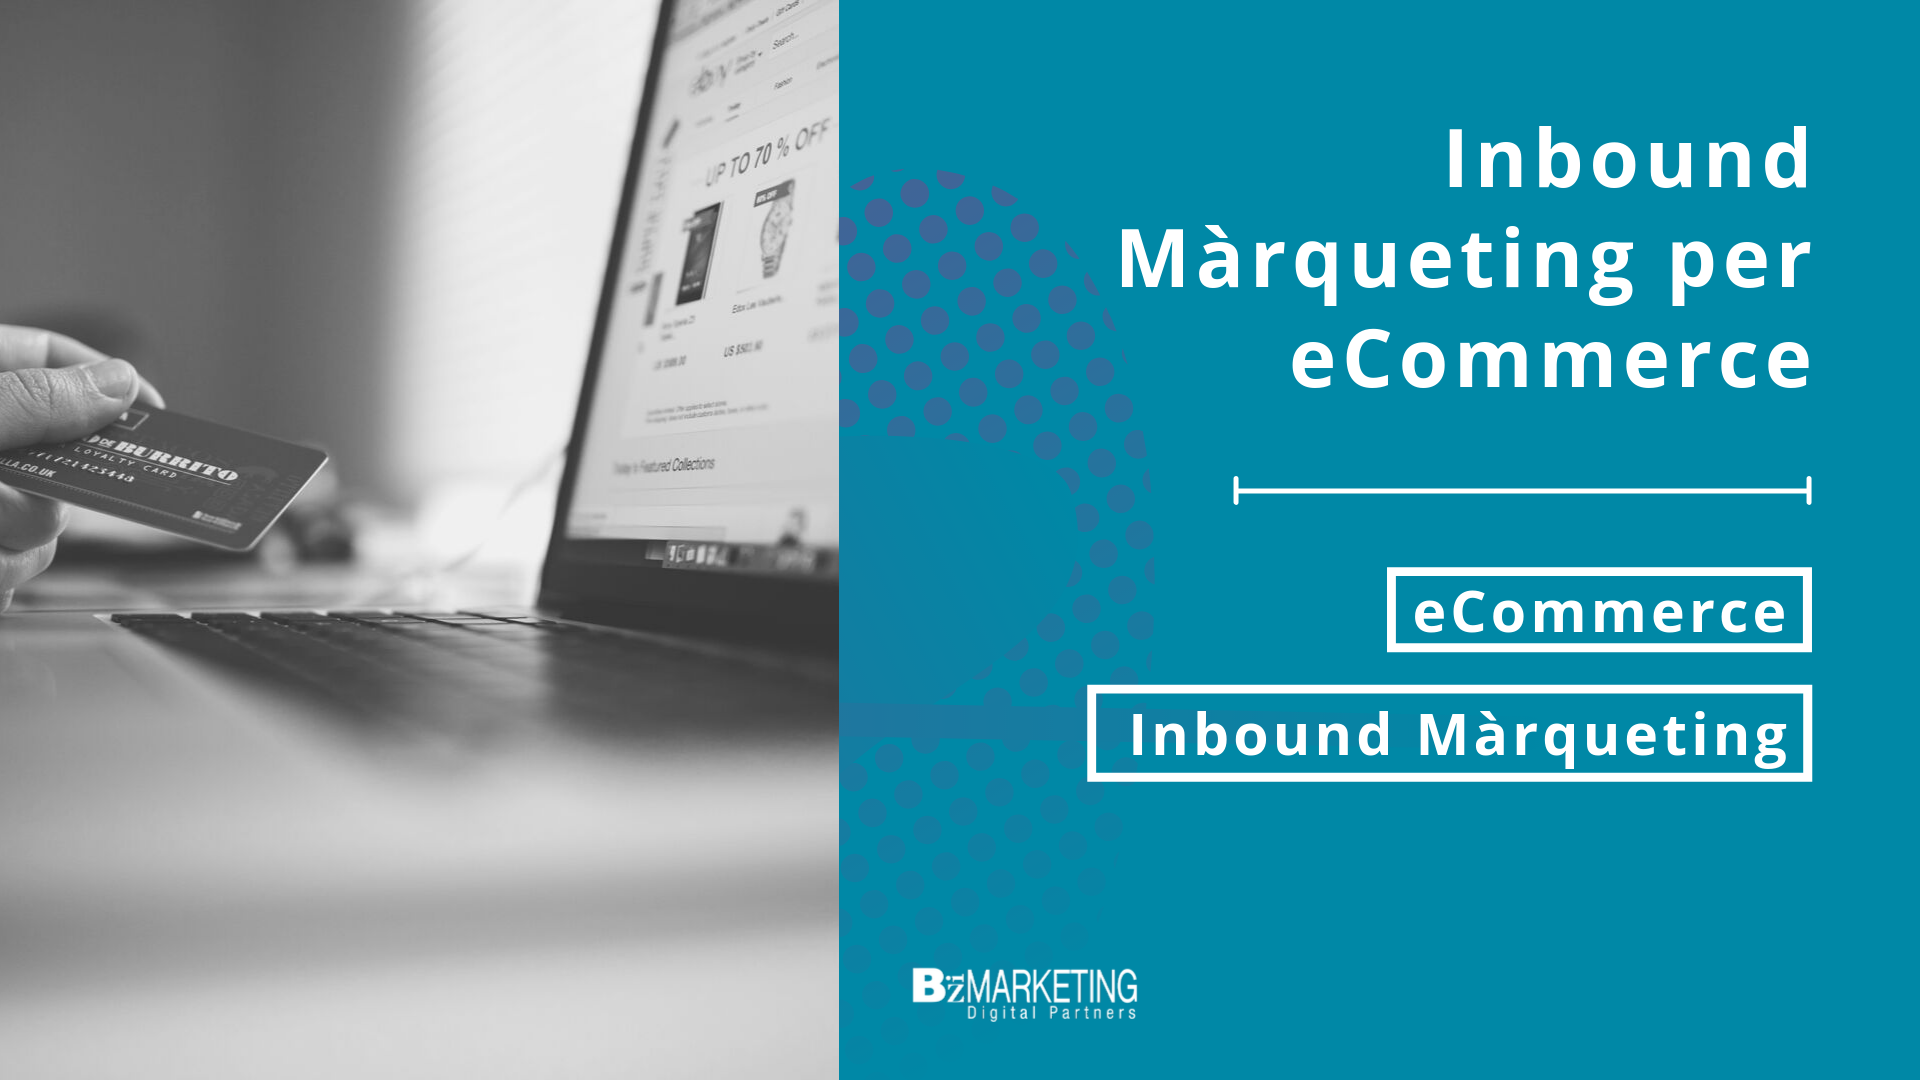 inbound-marqueting-per-ecommerce-agencia-girona-bizmarketing